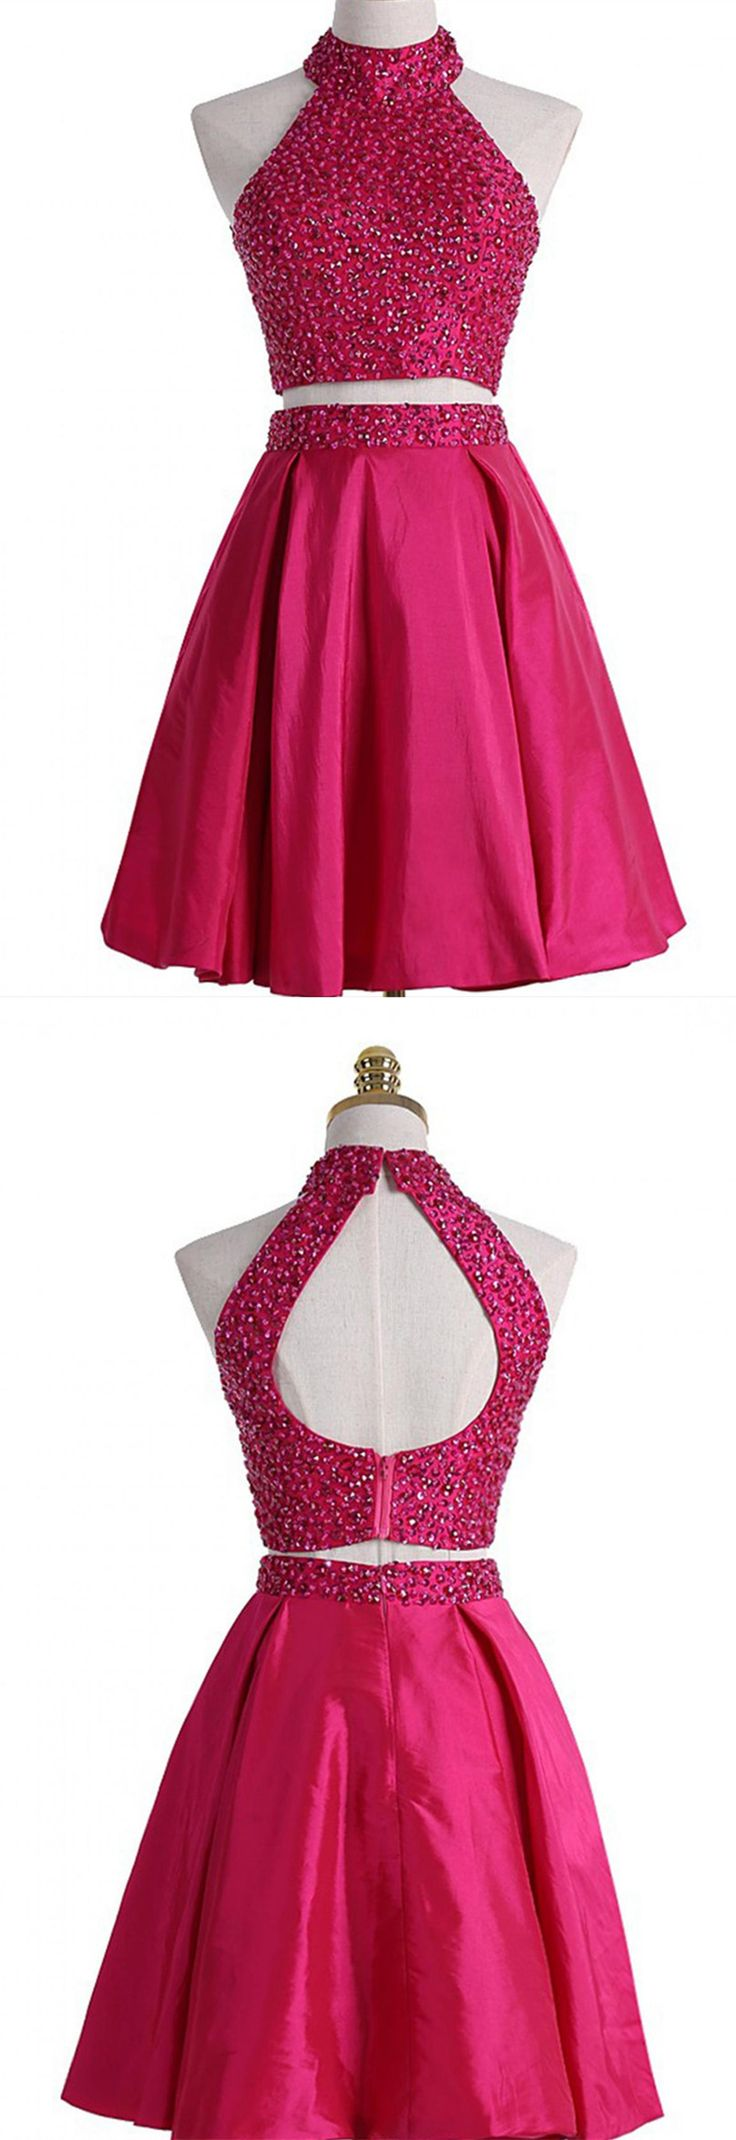 Real Made Halter Beading Homecoming Dresses,Sexy Party Dress,Charming Homecoming Dress,Graduation Dress,Homecoming Dress